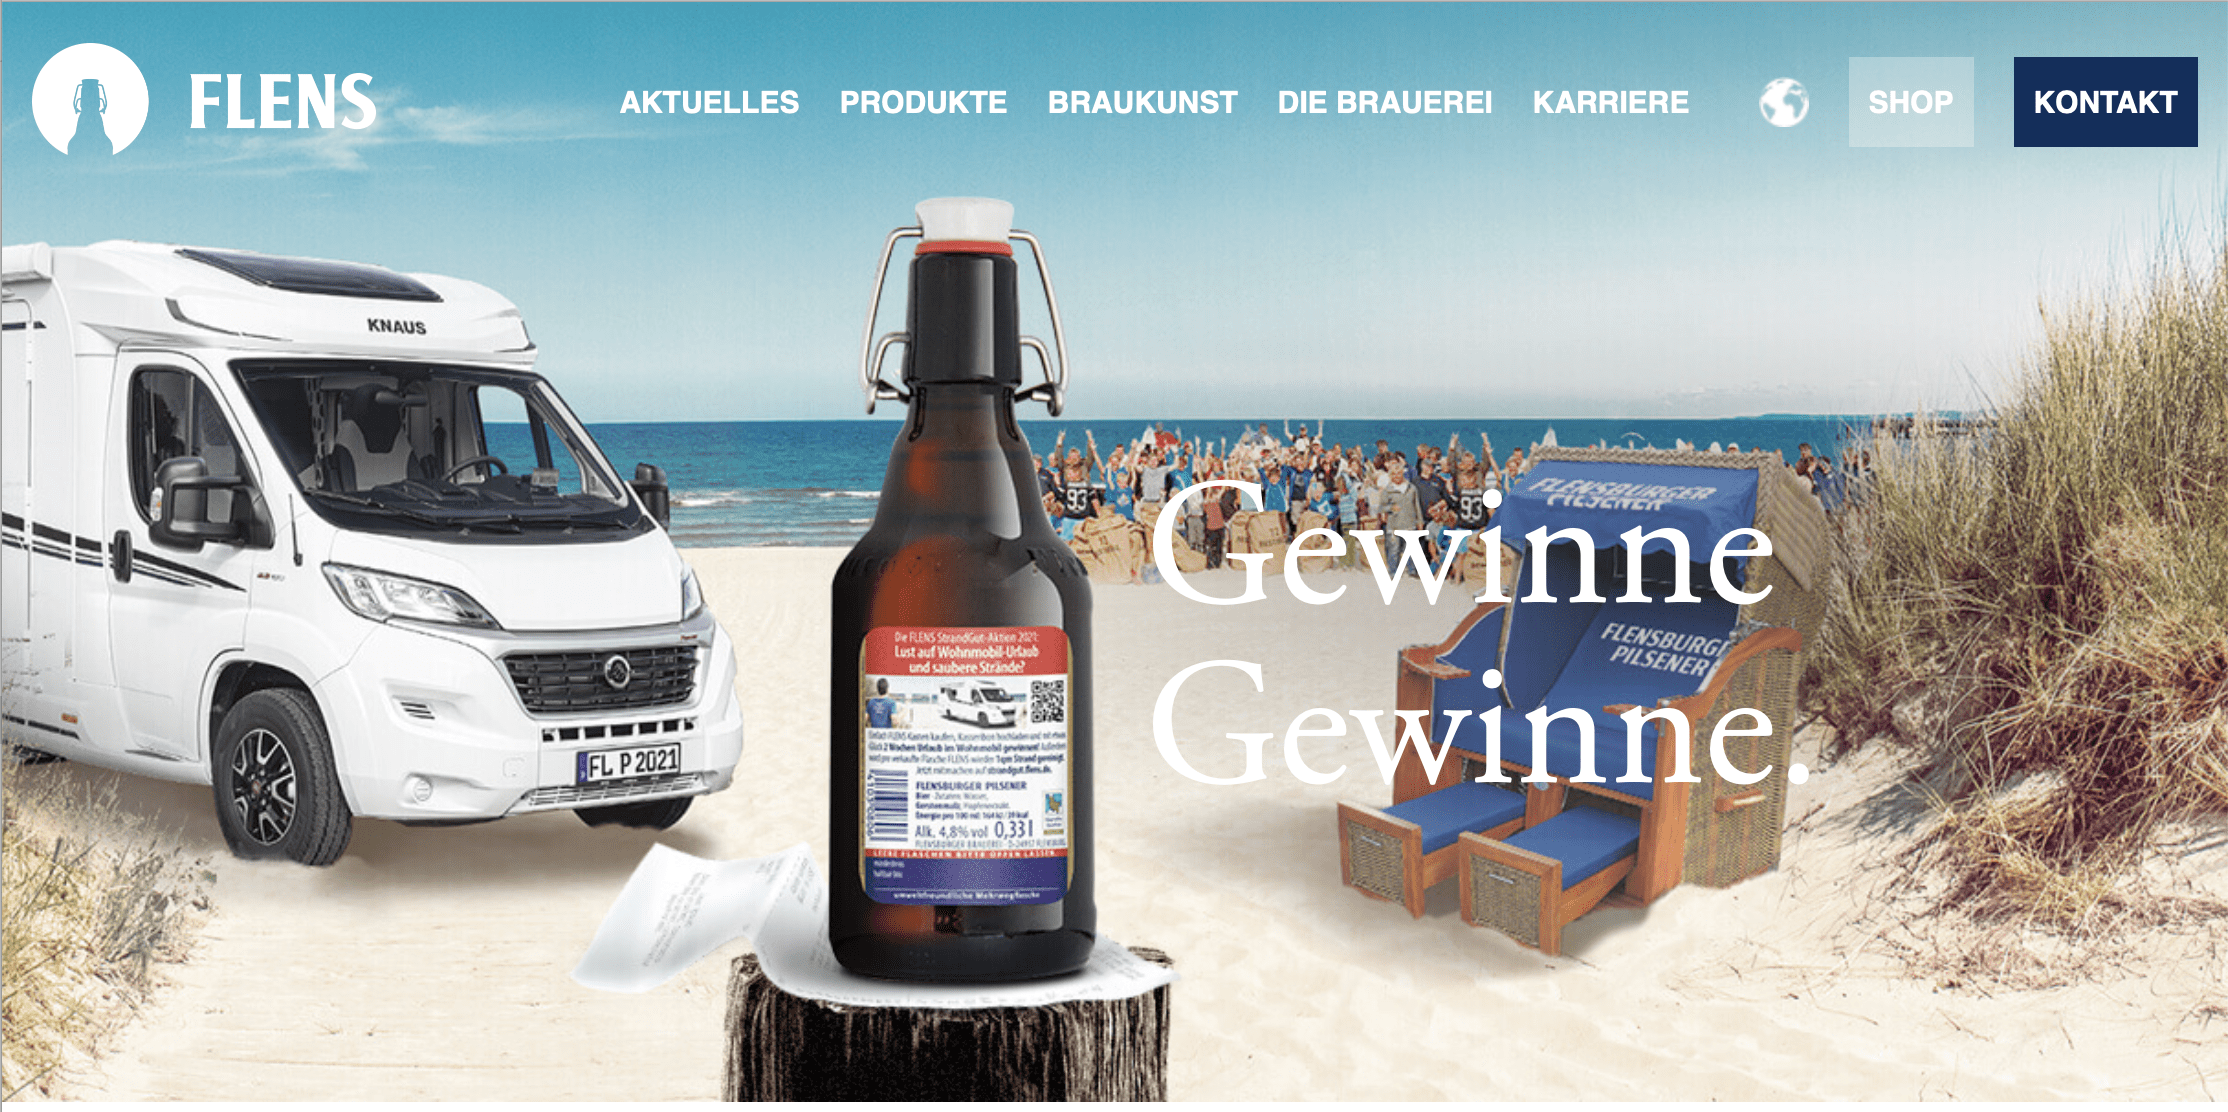 Flensburger Gewinnspiel-Cases FMCG Getränke